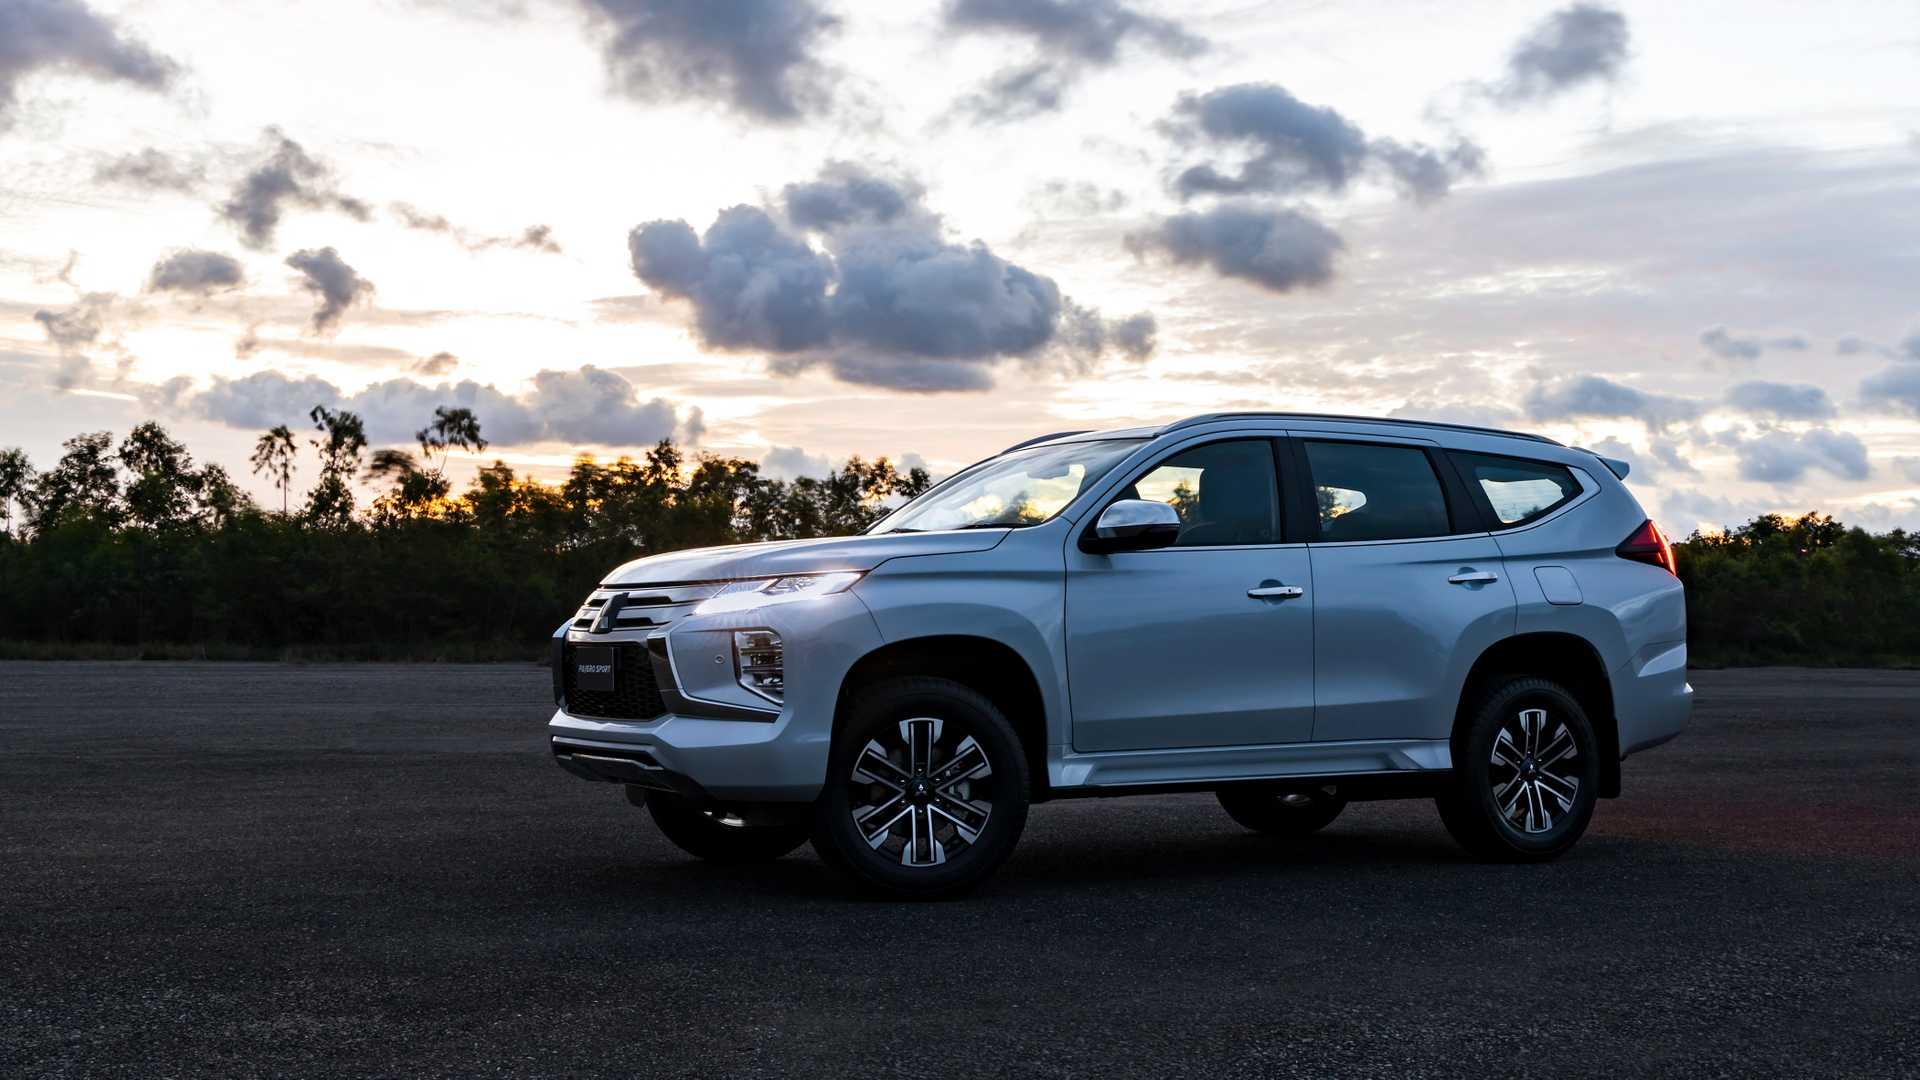 2020_Mitsubishi_Pajero_Sport_facelift_0011